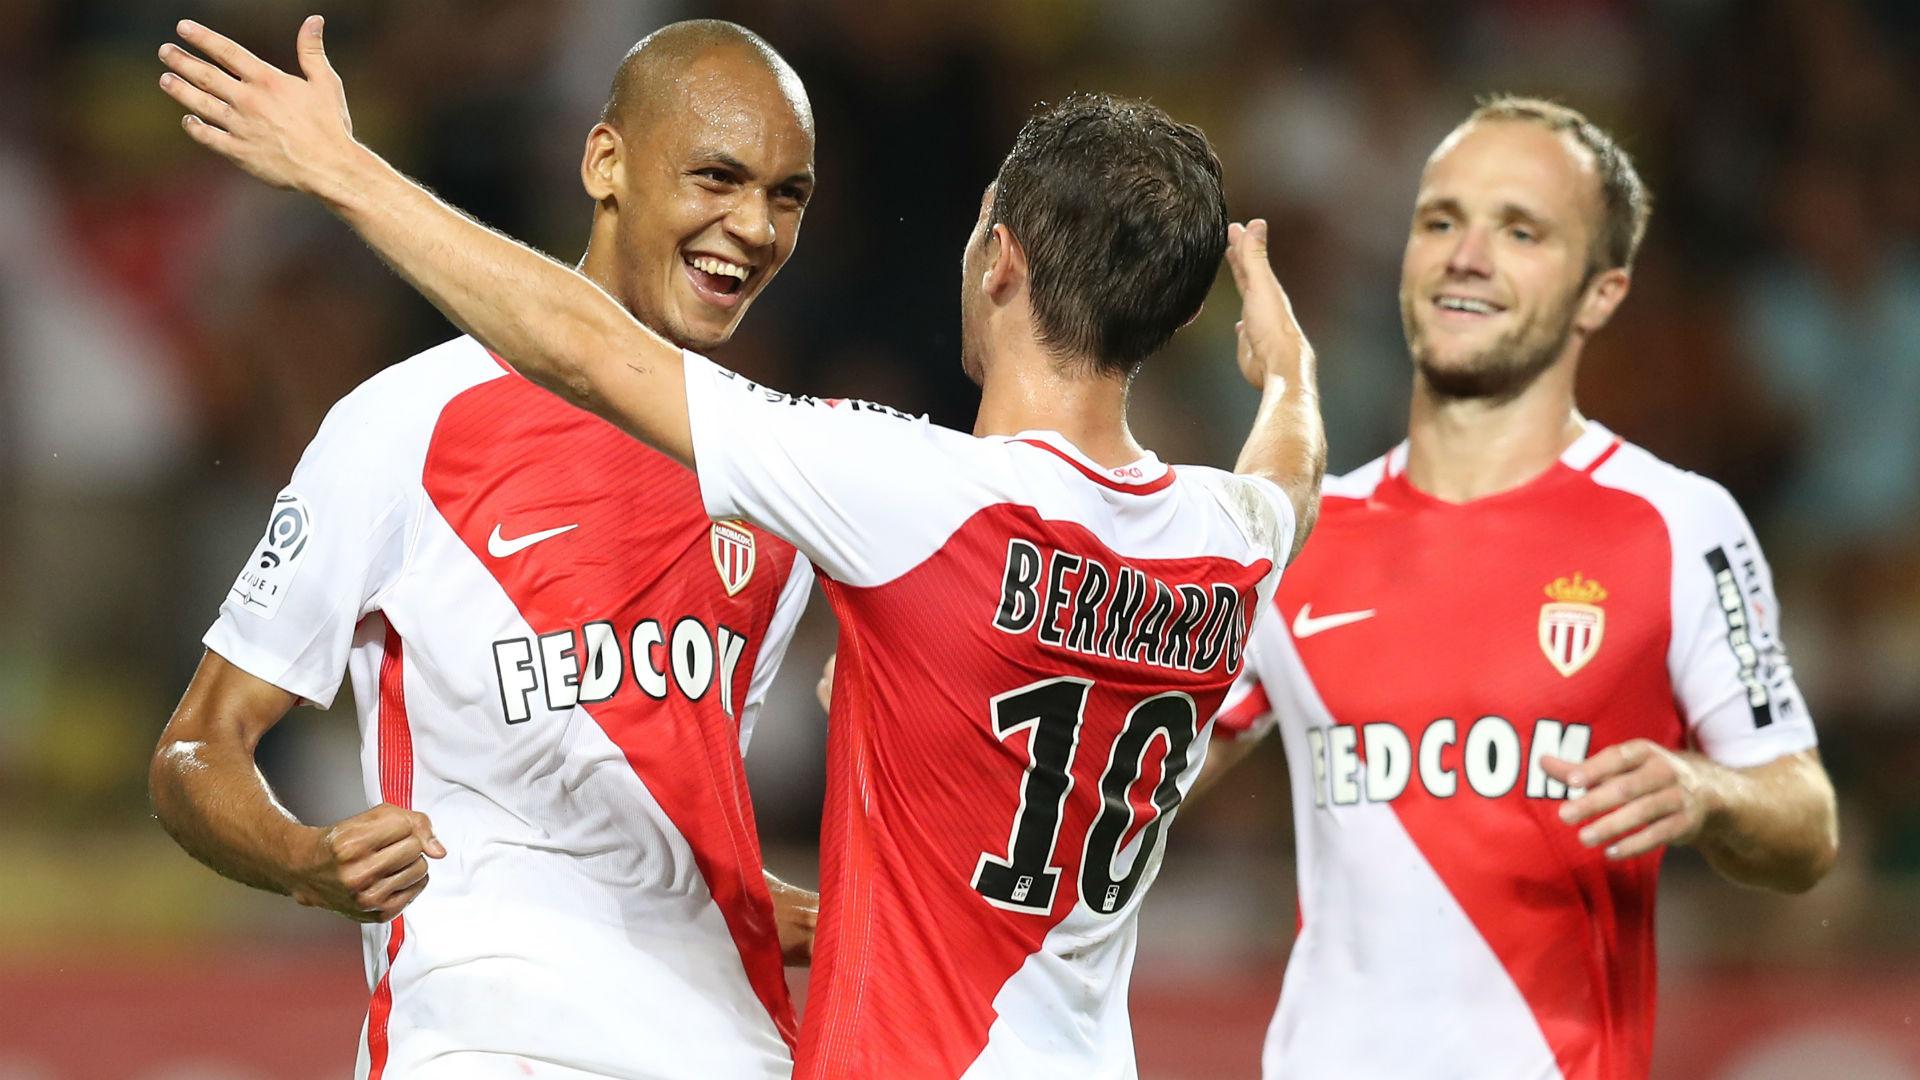 Falcao fires Monaco closer to Ligue 1 title as Balotelli misfires ...